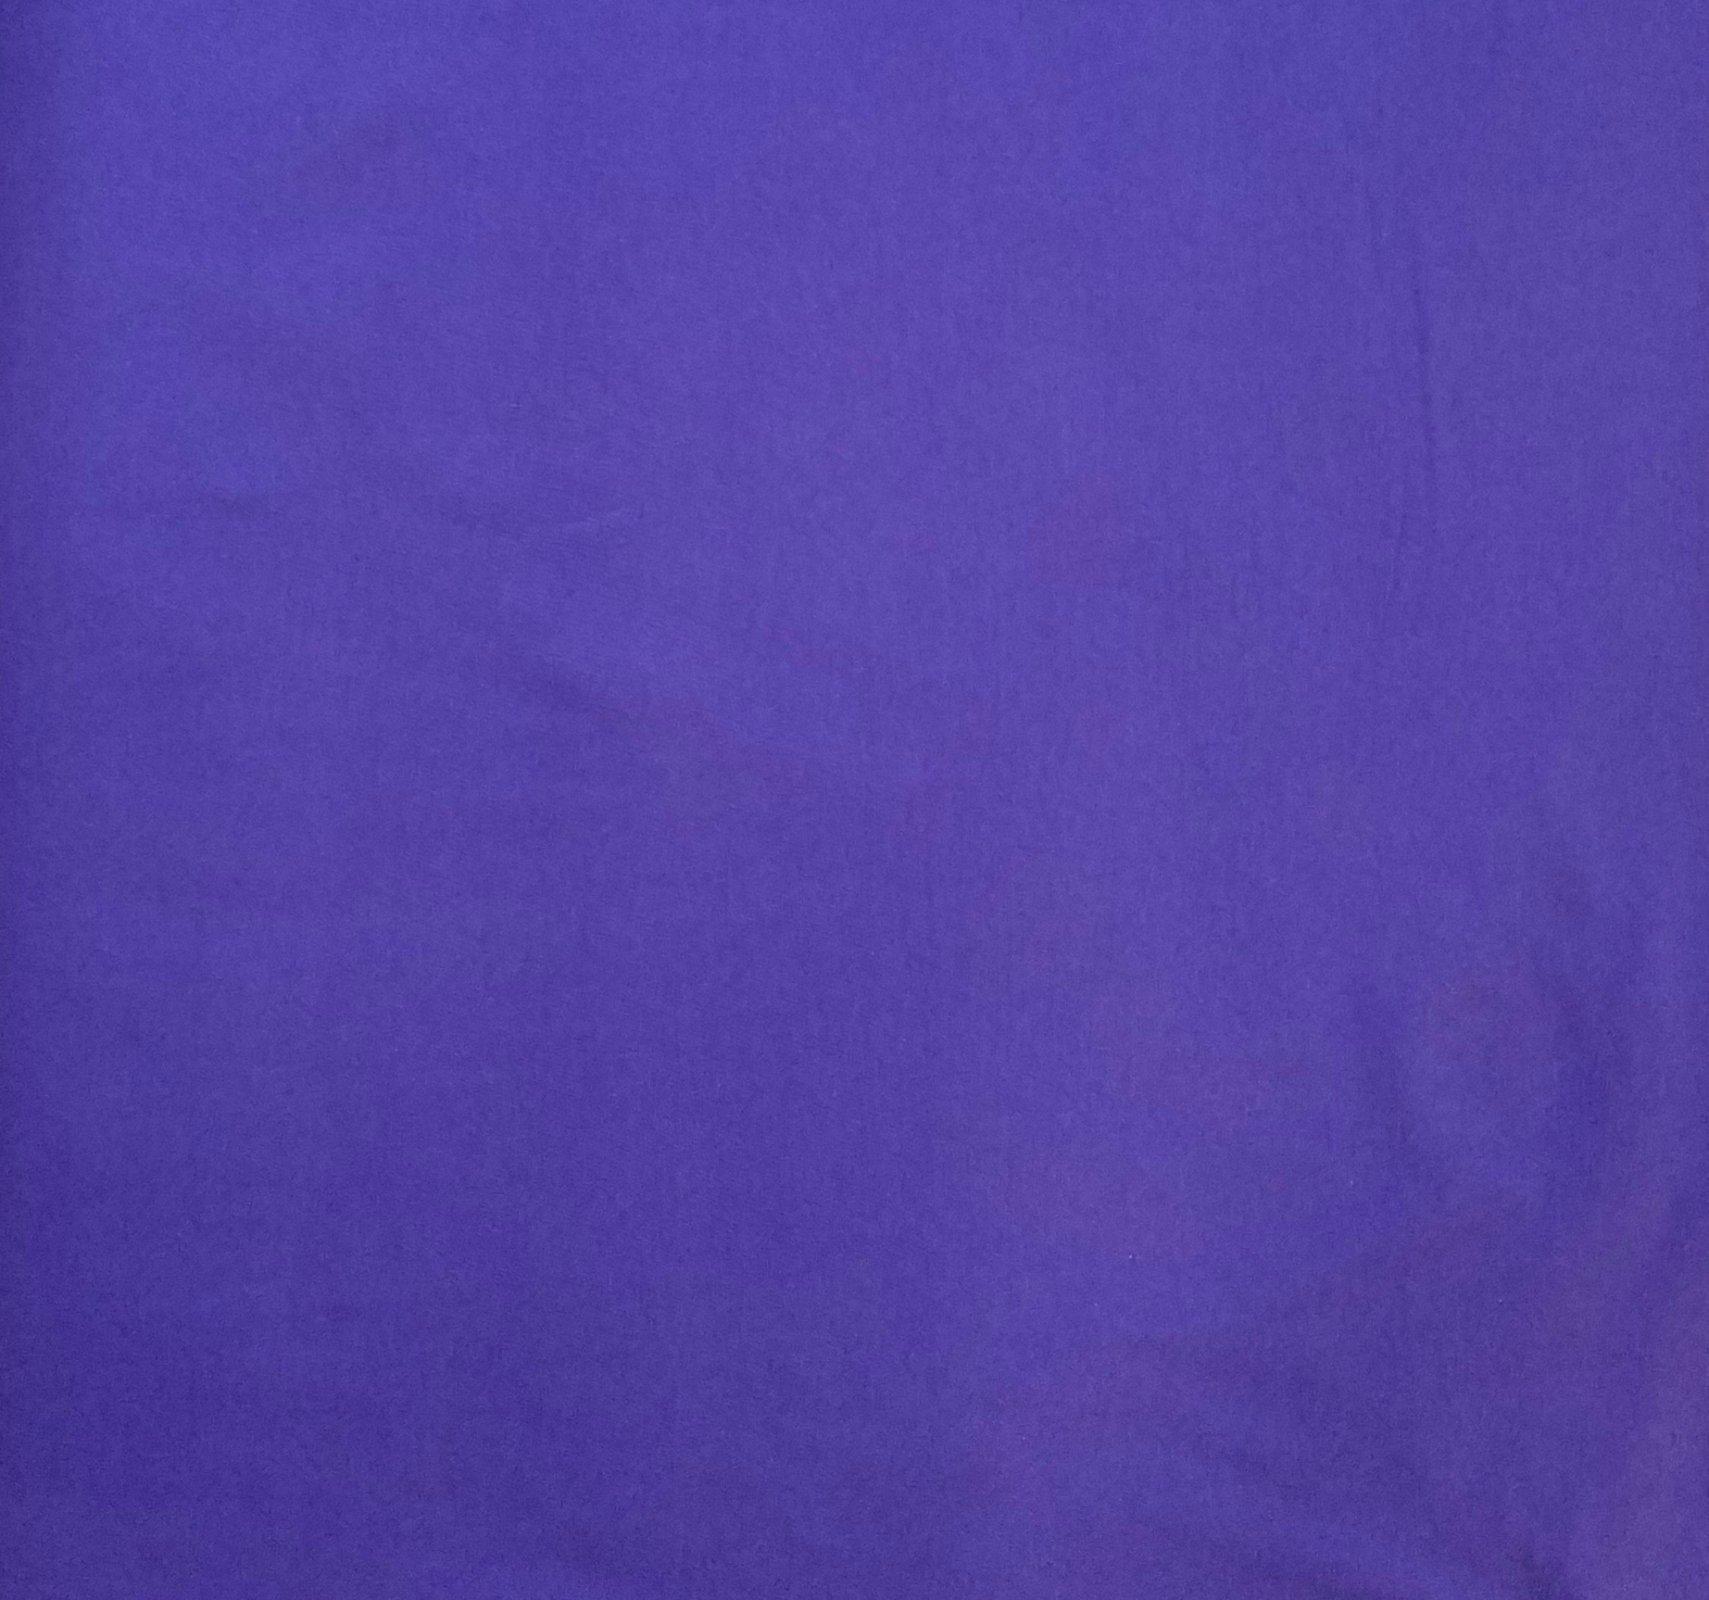 Amethyst - Cotton/Spandex Knit